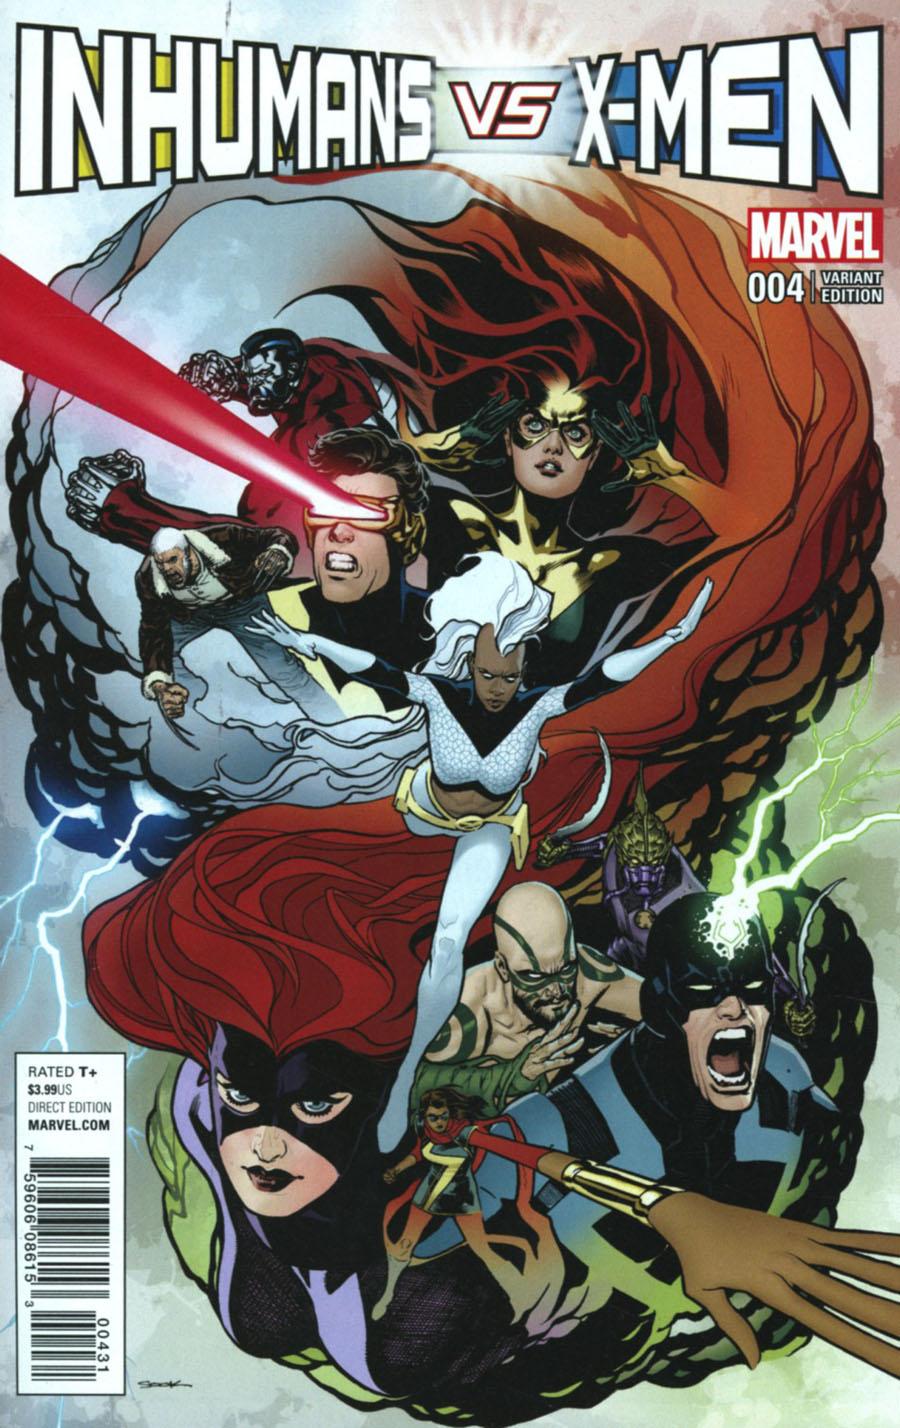 Inhumans vs X-Men #4 Cover F Incentive Ryan Sook Variant Cover